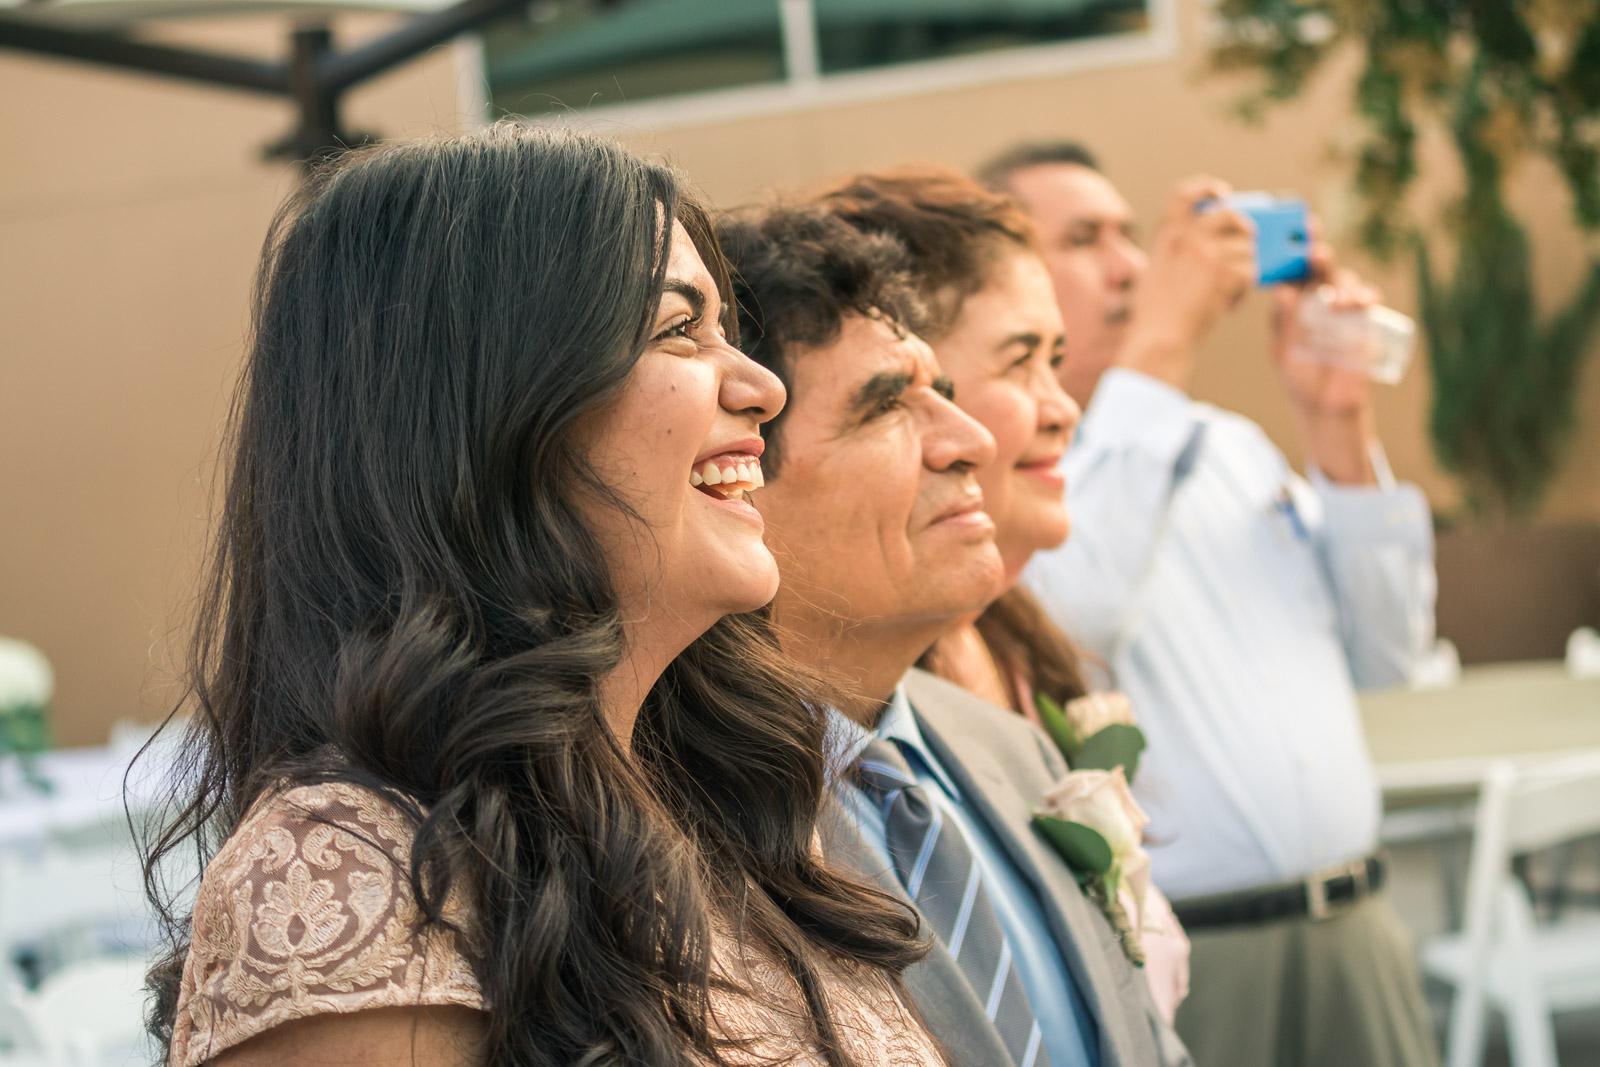 281_Angel-Brea-Orange-County_Joseph-Barber-Wedding-Photography.jpg